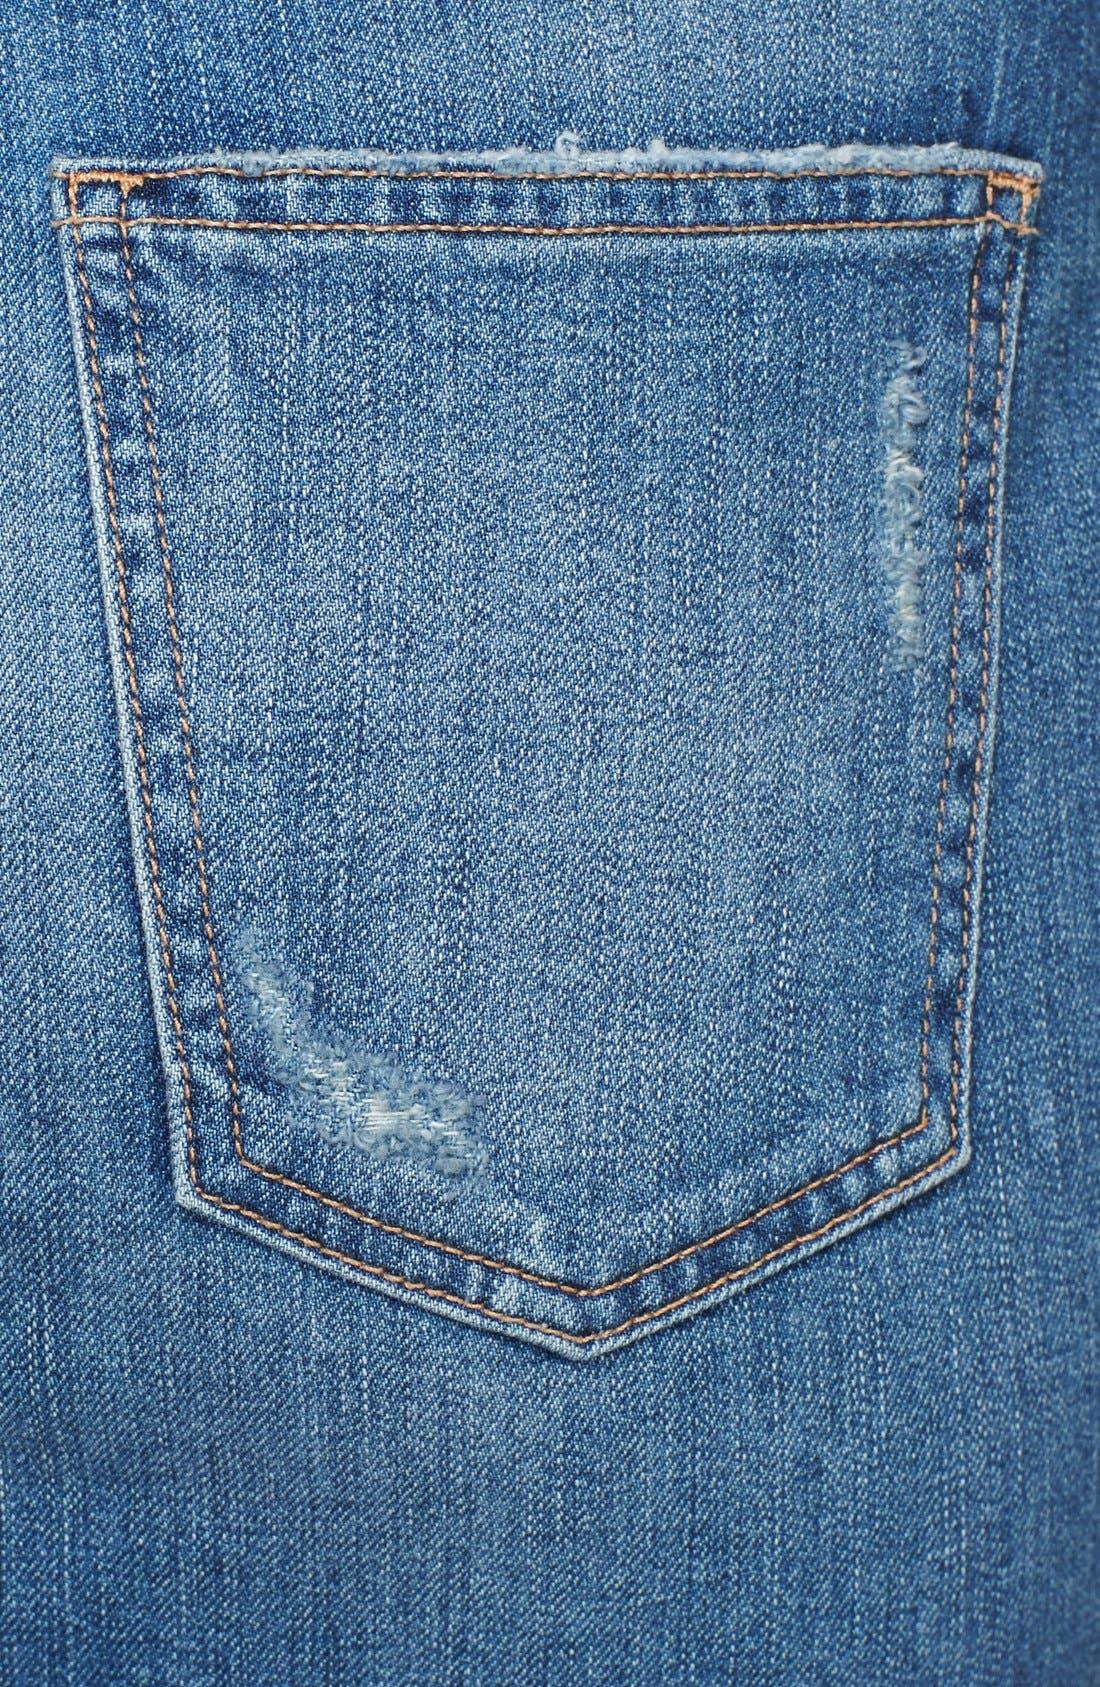 Alternate Image 3  - Current/Elliott 'The Stiletto' Denim Pencil Skirt